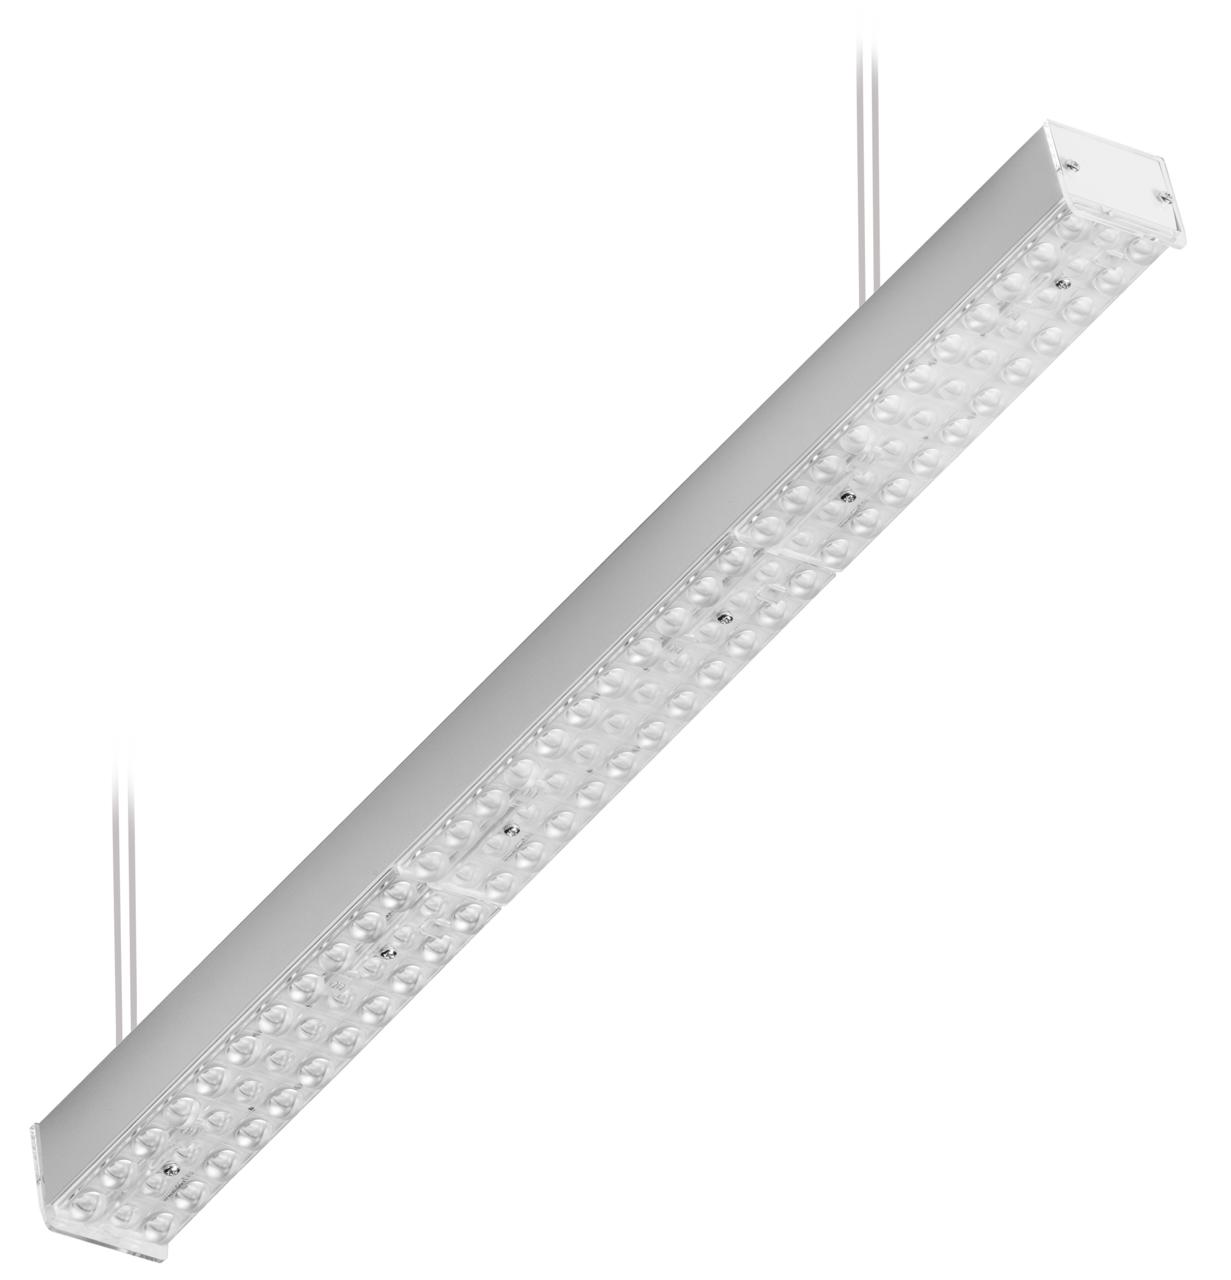 Светильник LED Volga 110° 76Вт 9600лм 4000К/5000К IP20 1152х69х63мм